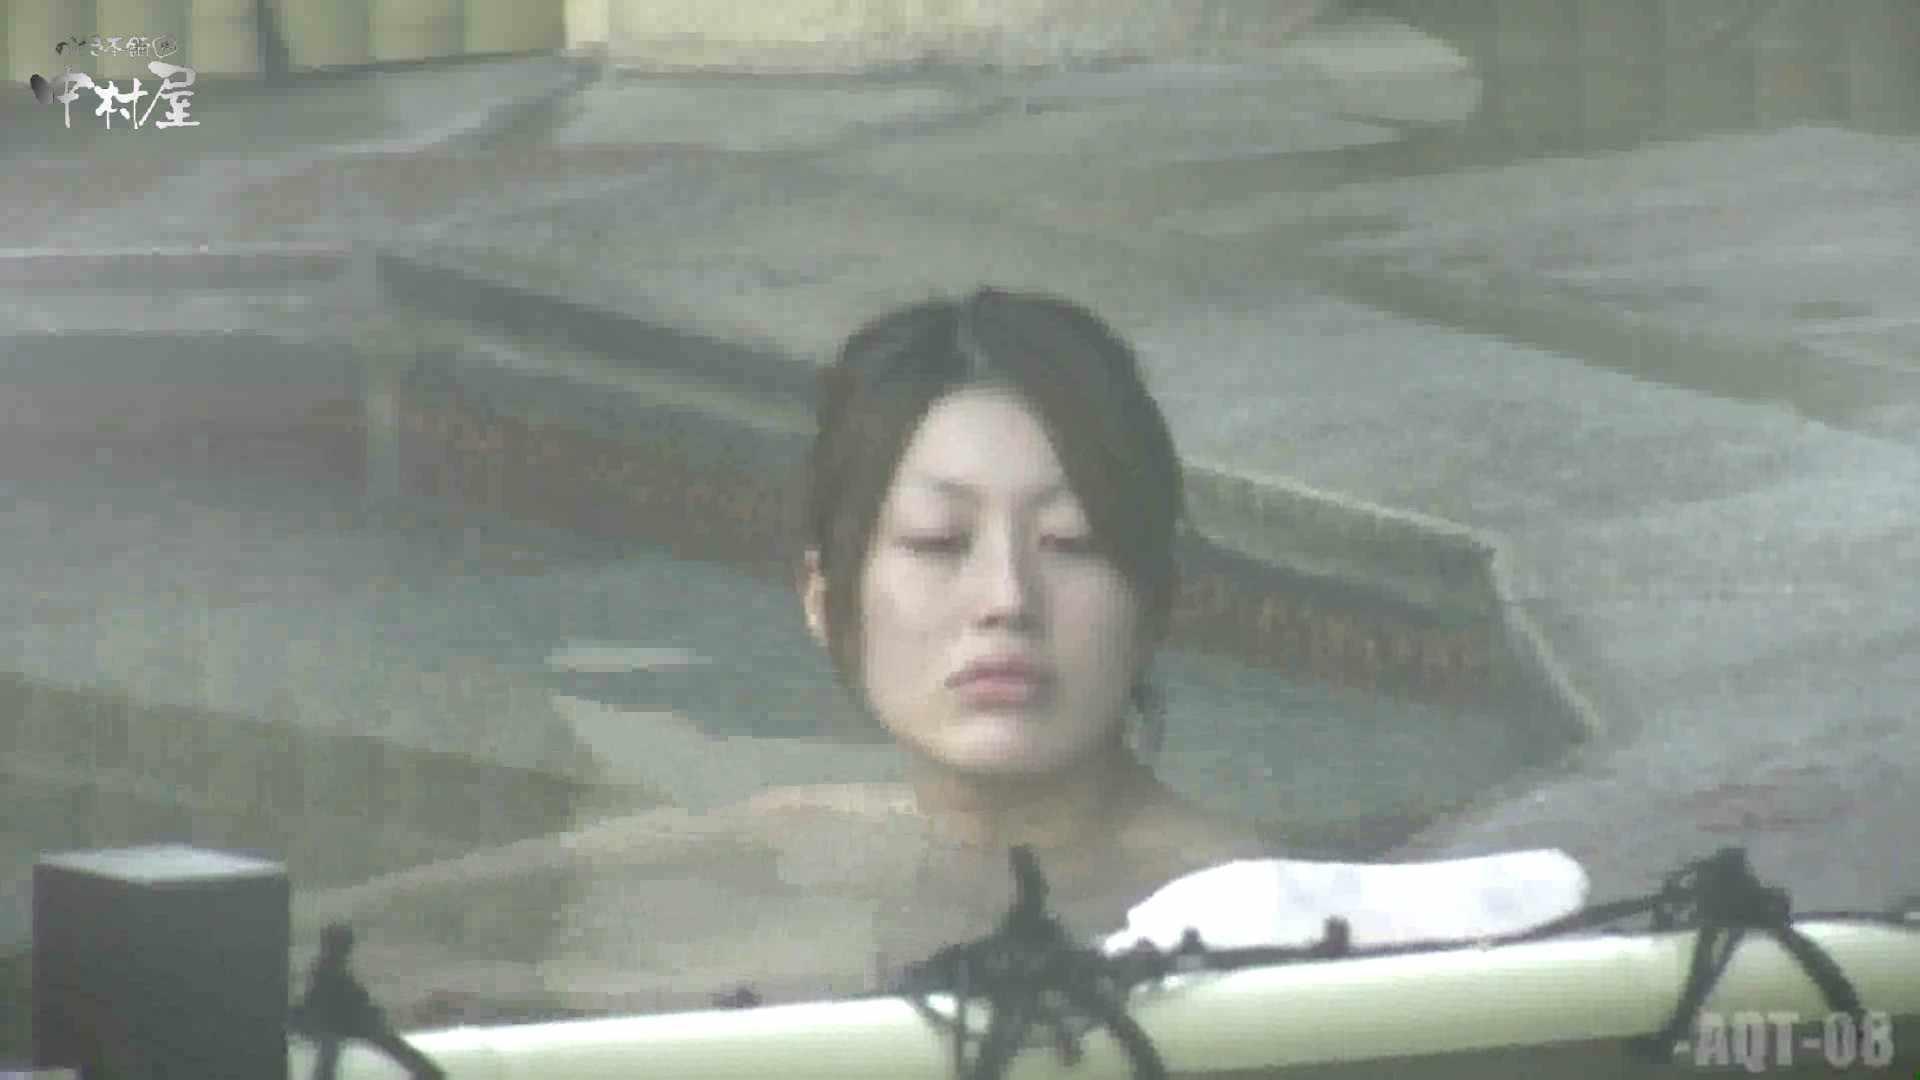 Aquaな露天風呂Vol.872潜入盗撮露天風呂八判湯 其の三 OLセックス  106画像 76